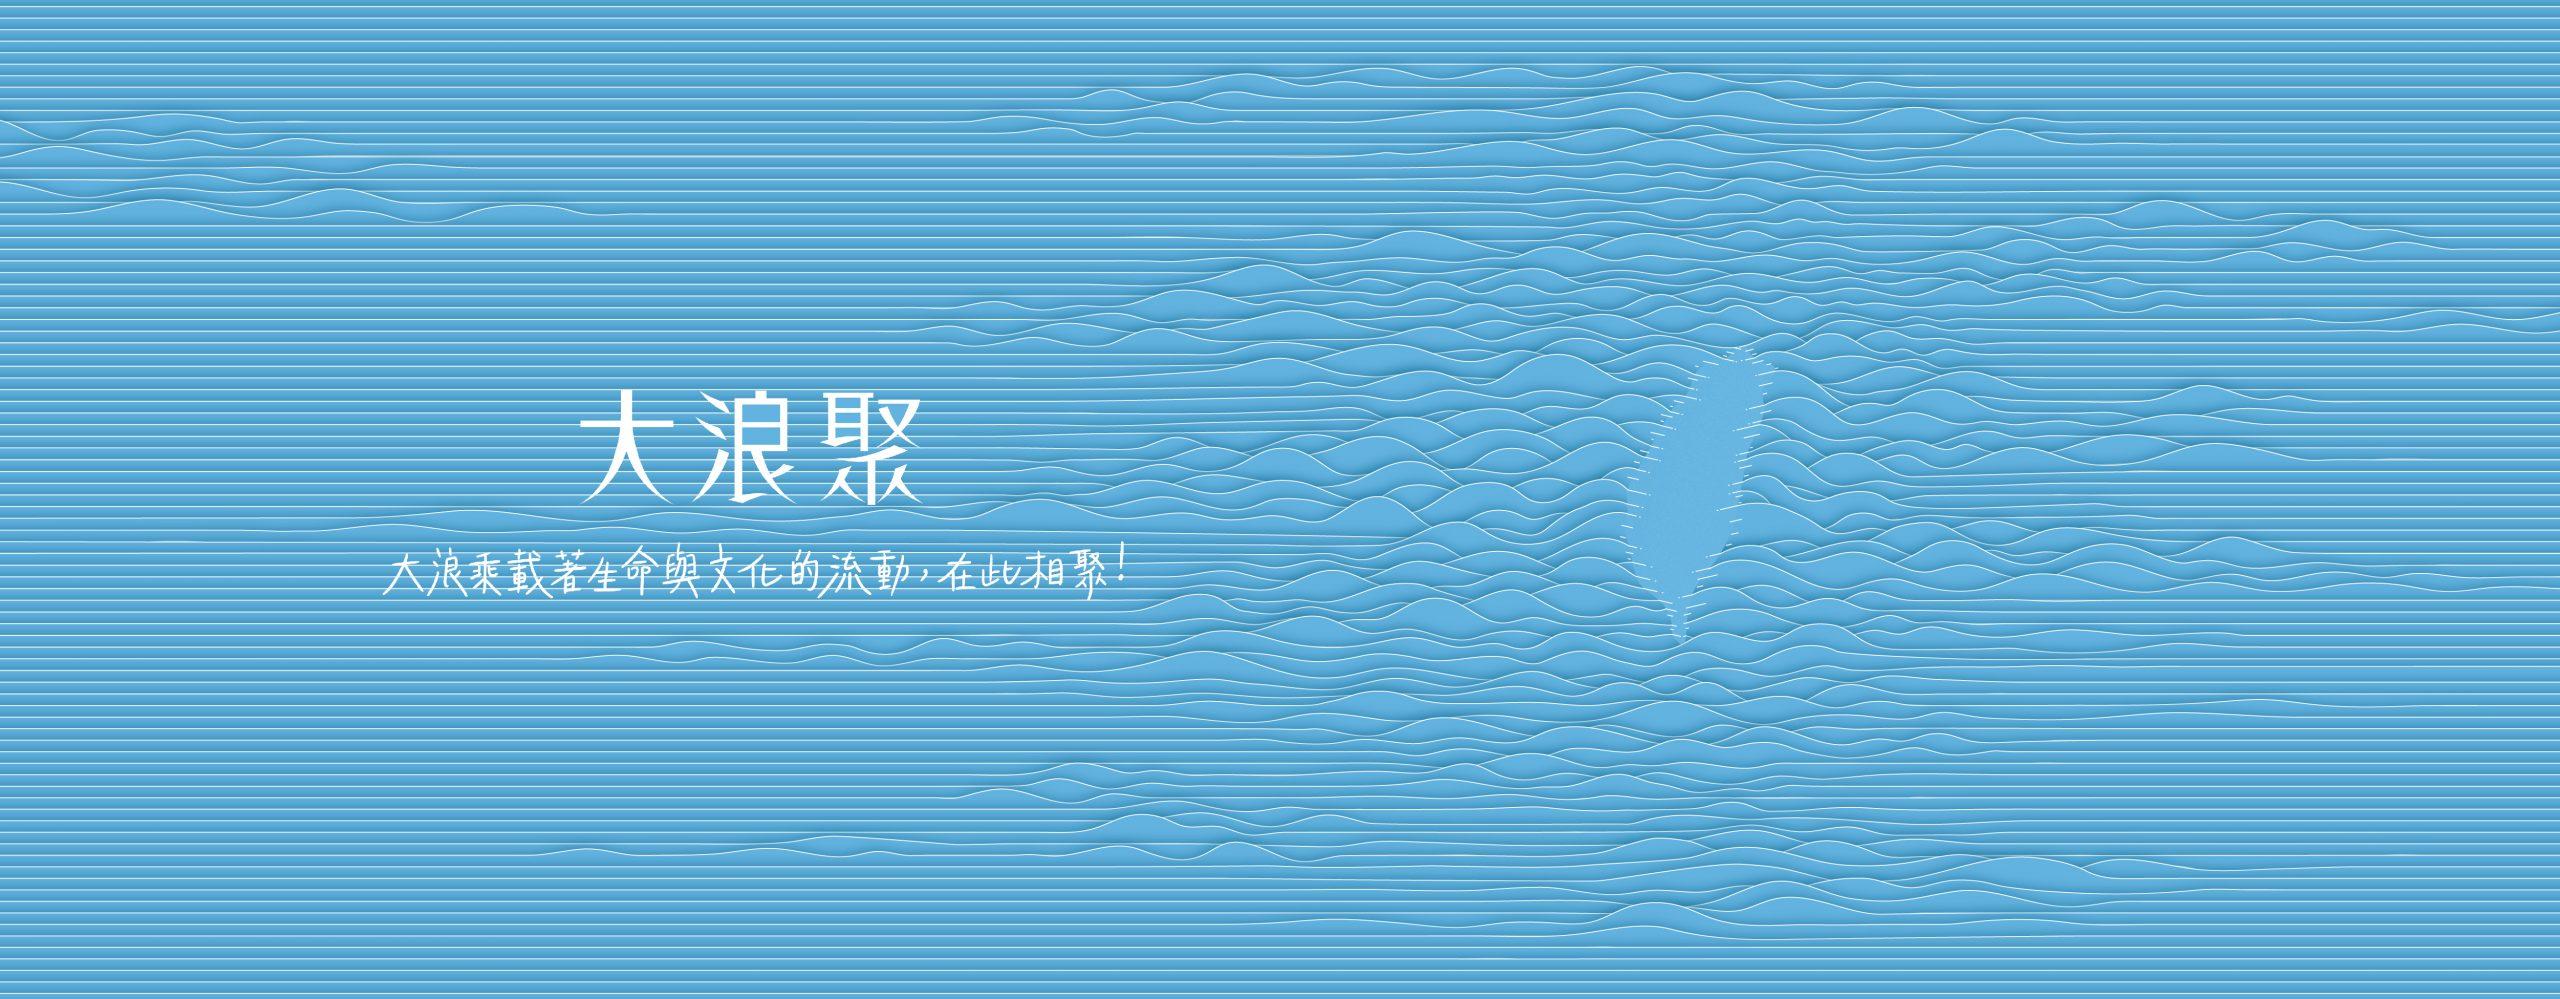 banner(列印)YT+周圍波浪-2-03